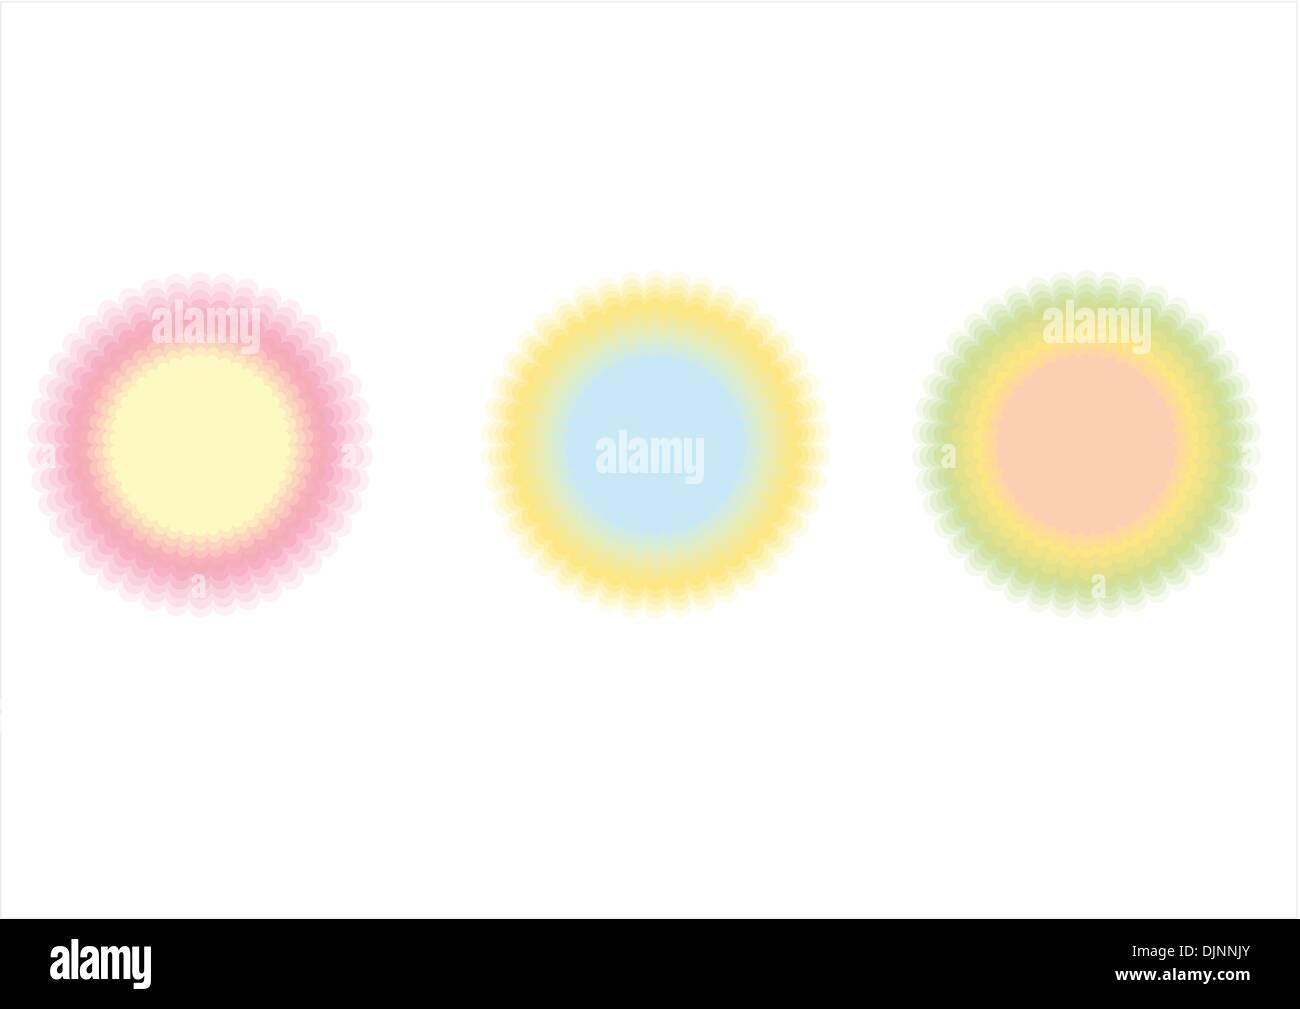 Enements Rings   Design Elements Rings Circlets Stock Vector Art Illustration